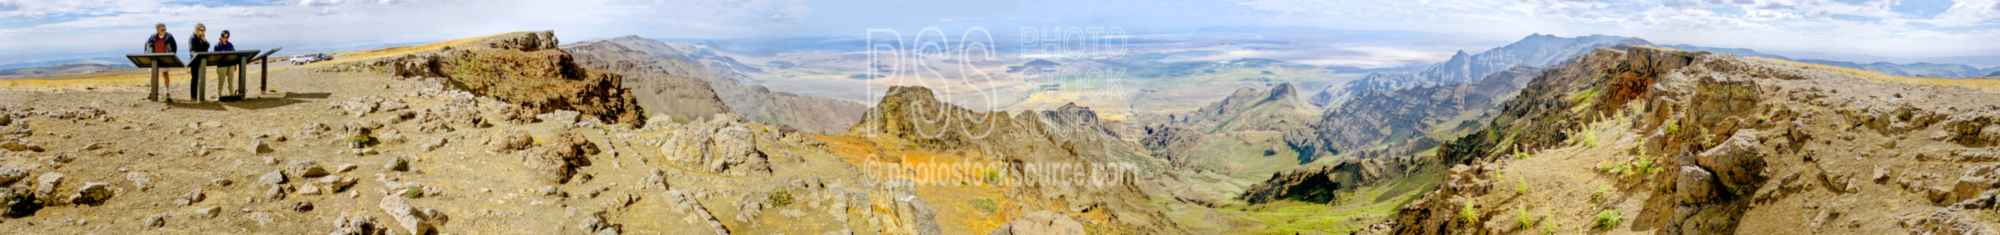 Steens Mt. Rim Viewpoint